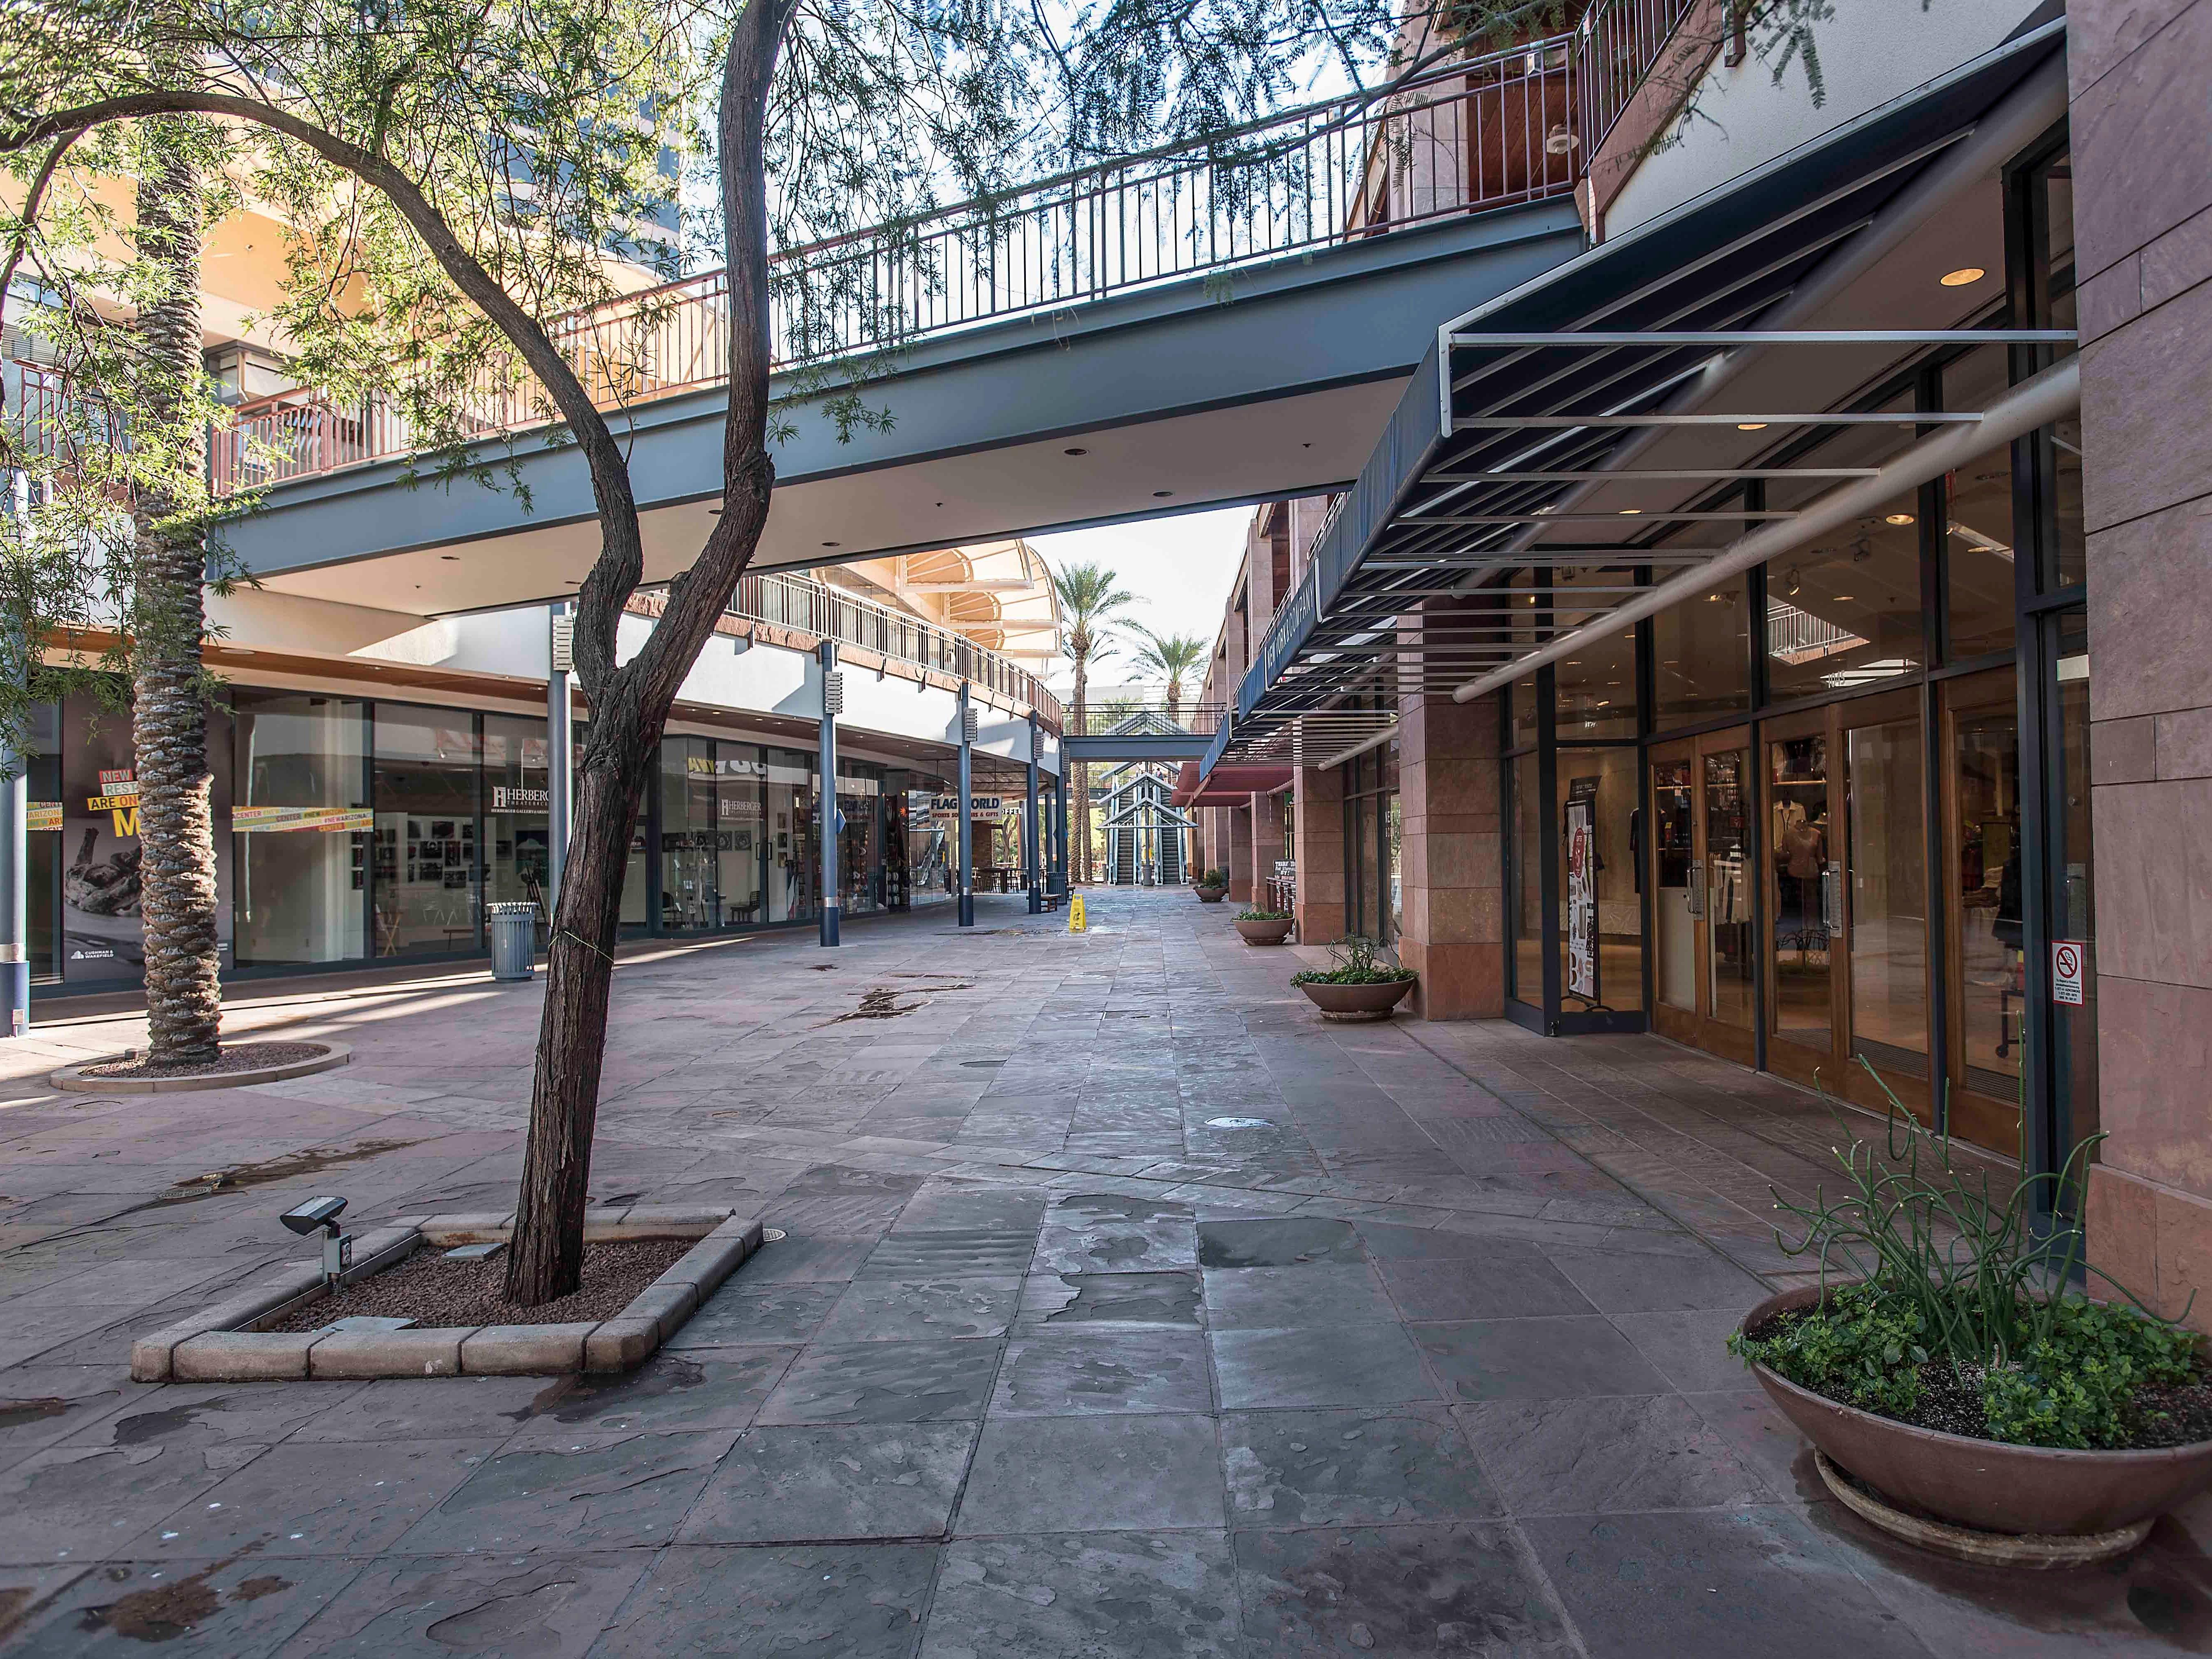 The Arizona Center's second-floor walkways prior to the renovation.